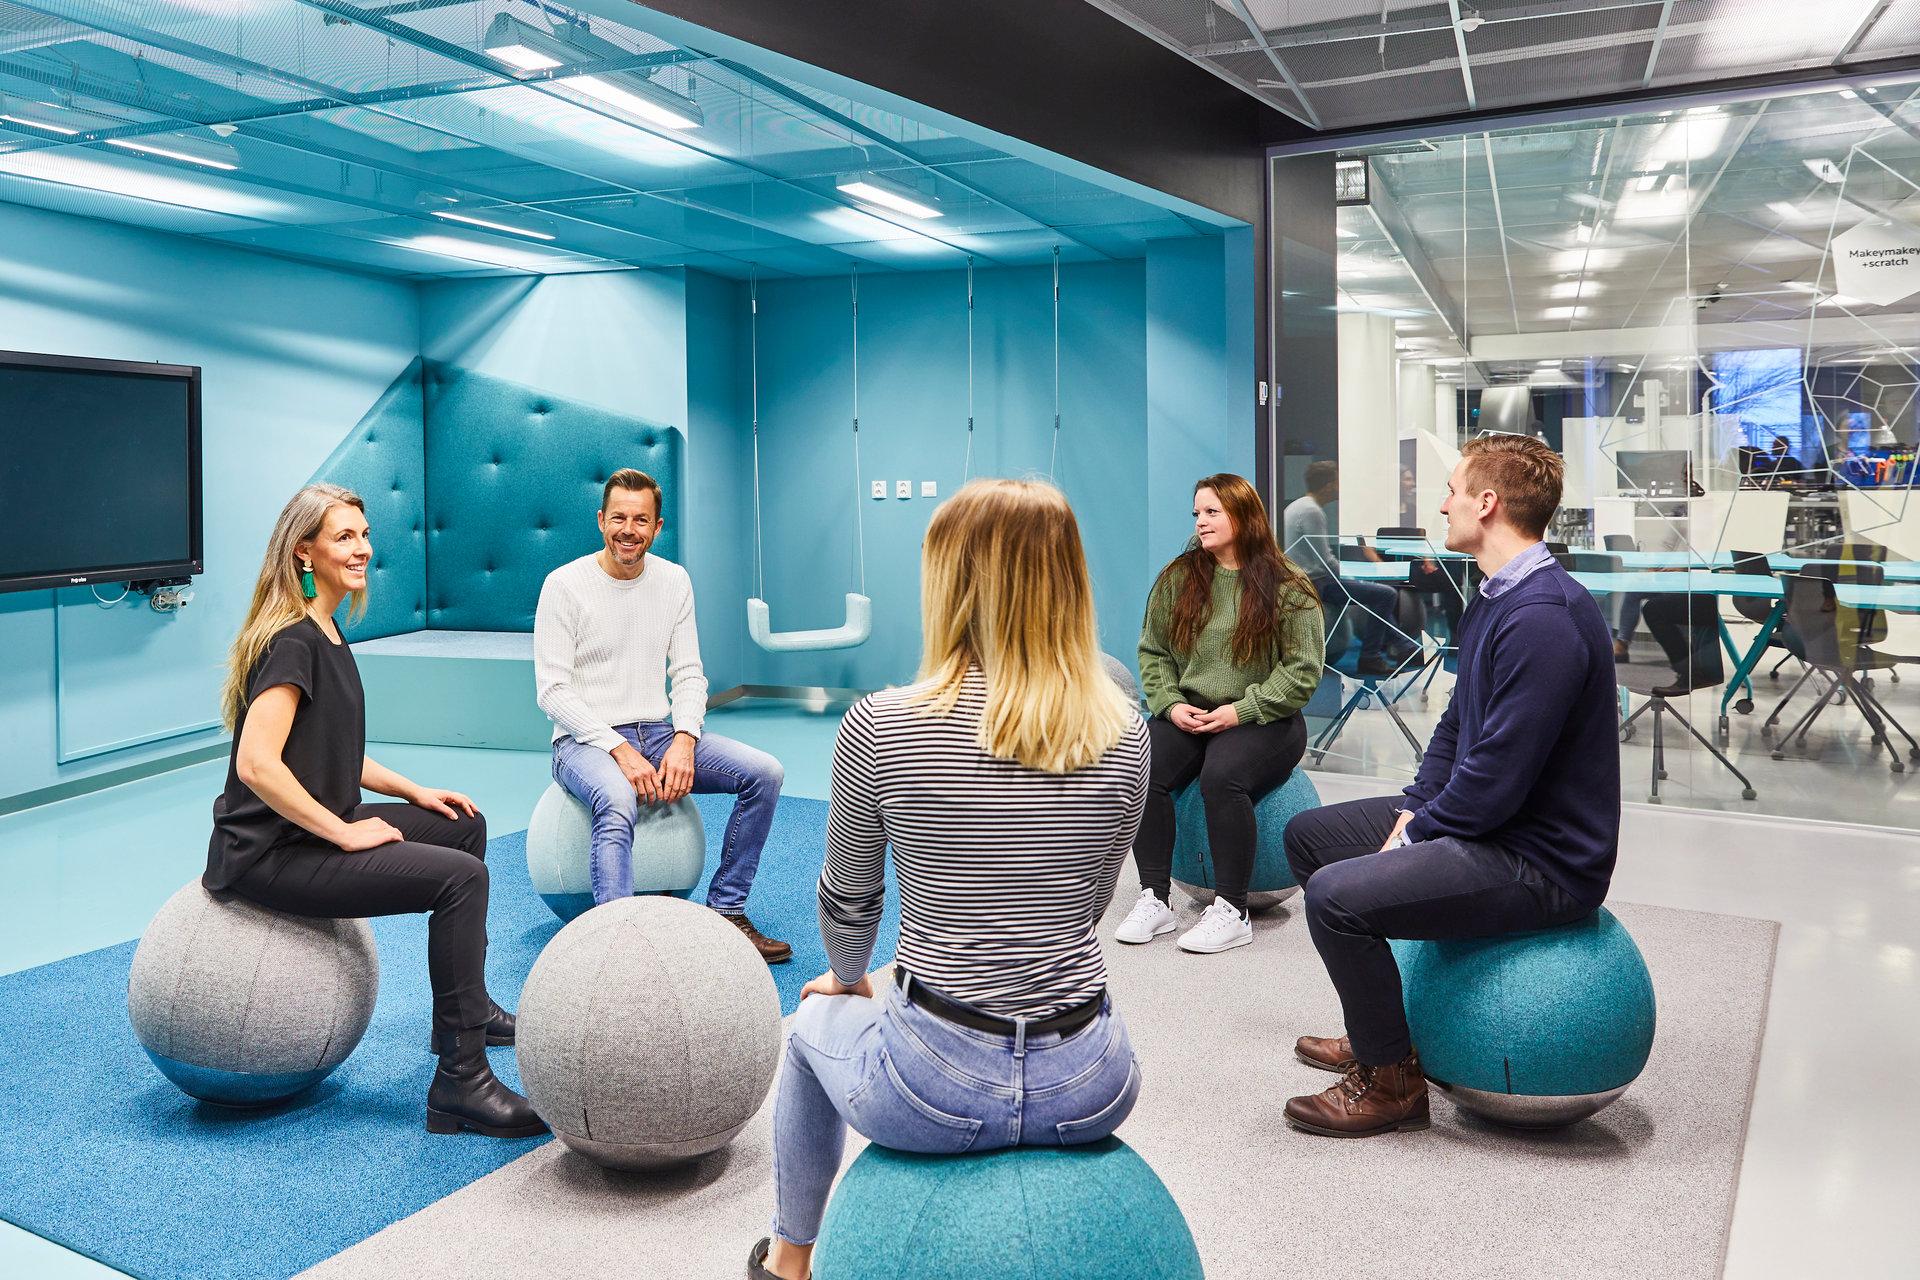 Möte i Create Hub hos Expectrum i Västerås. Fotograf: Pia Nordlander